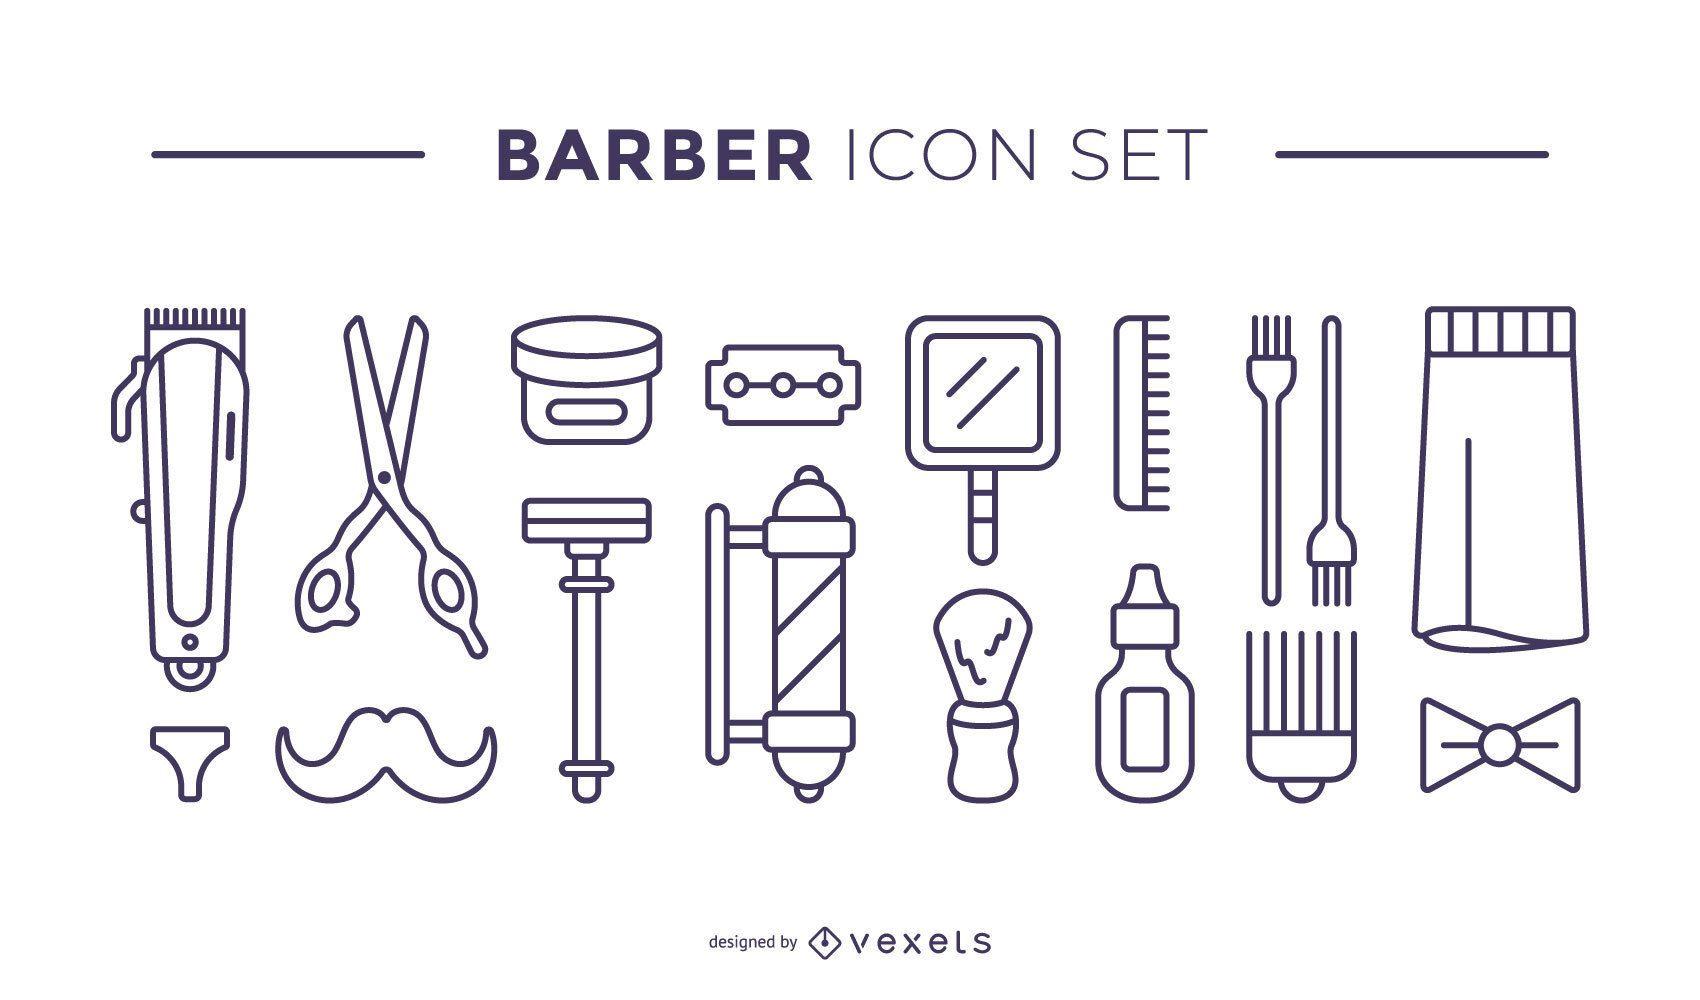 barber elements icon set